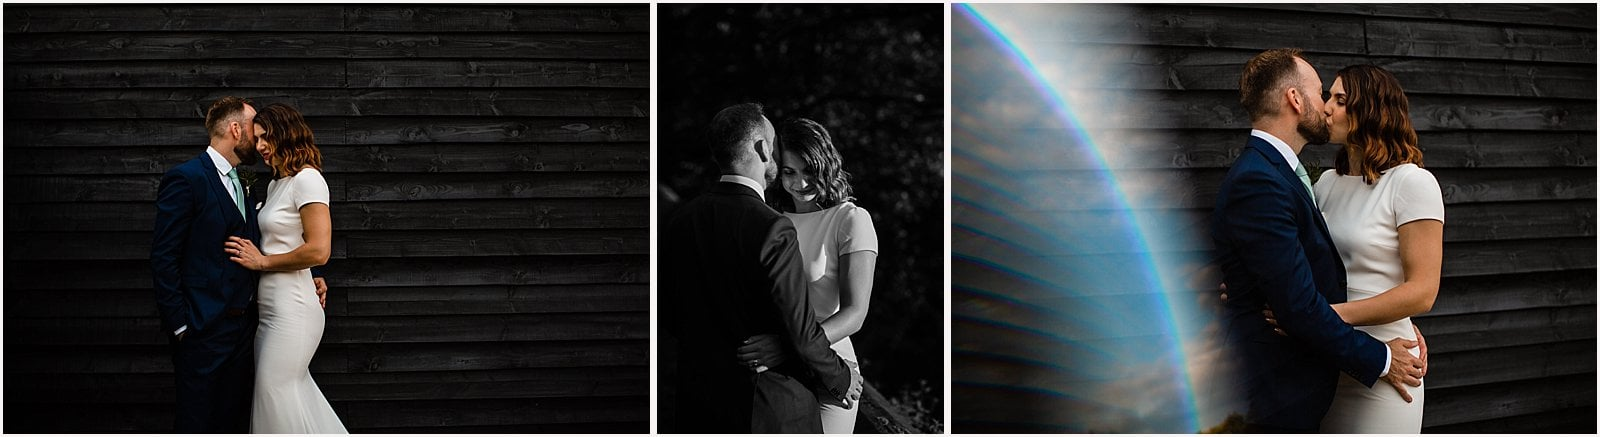 Millbridge Court Wedding - stunning summer wedding - wedding photography 59